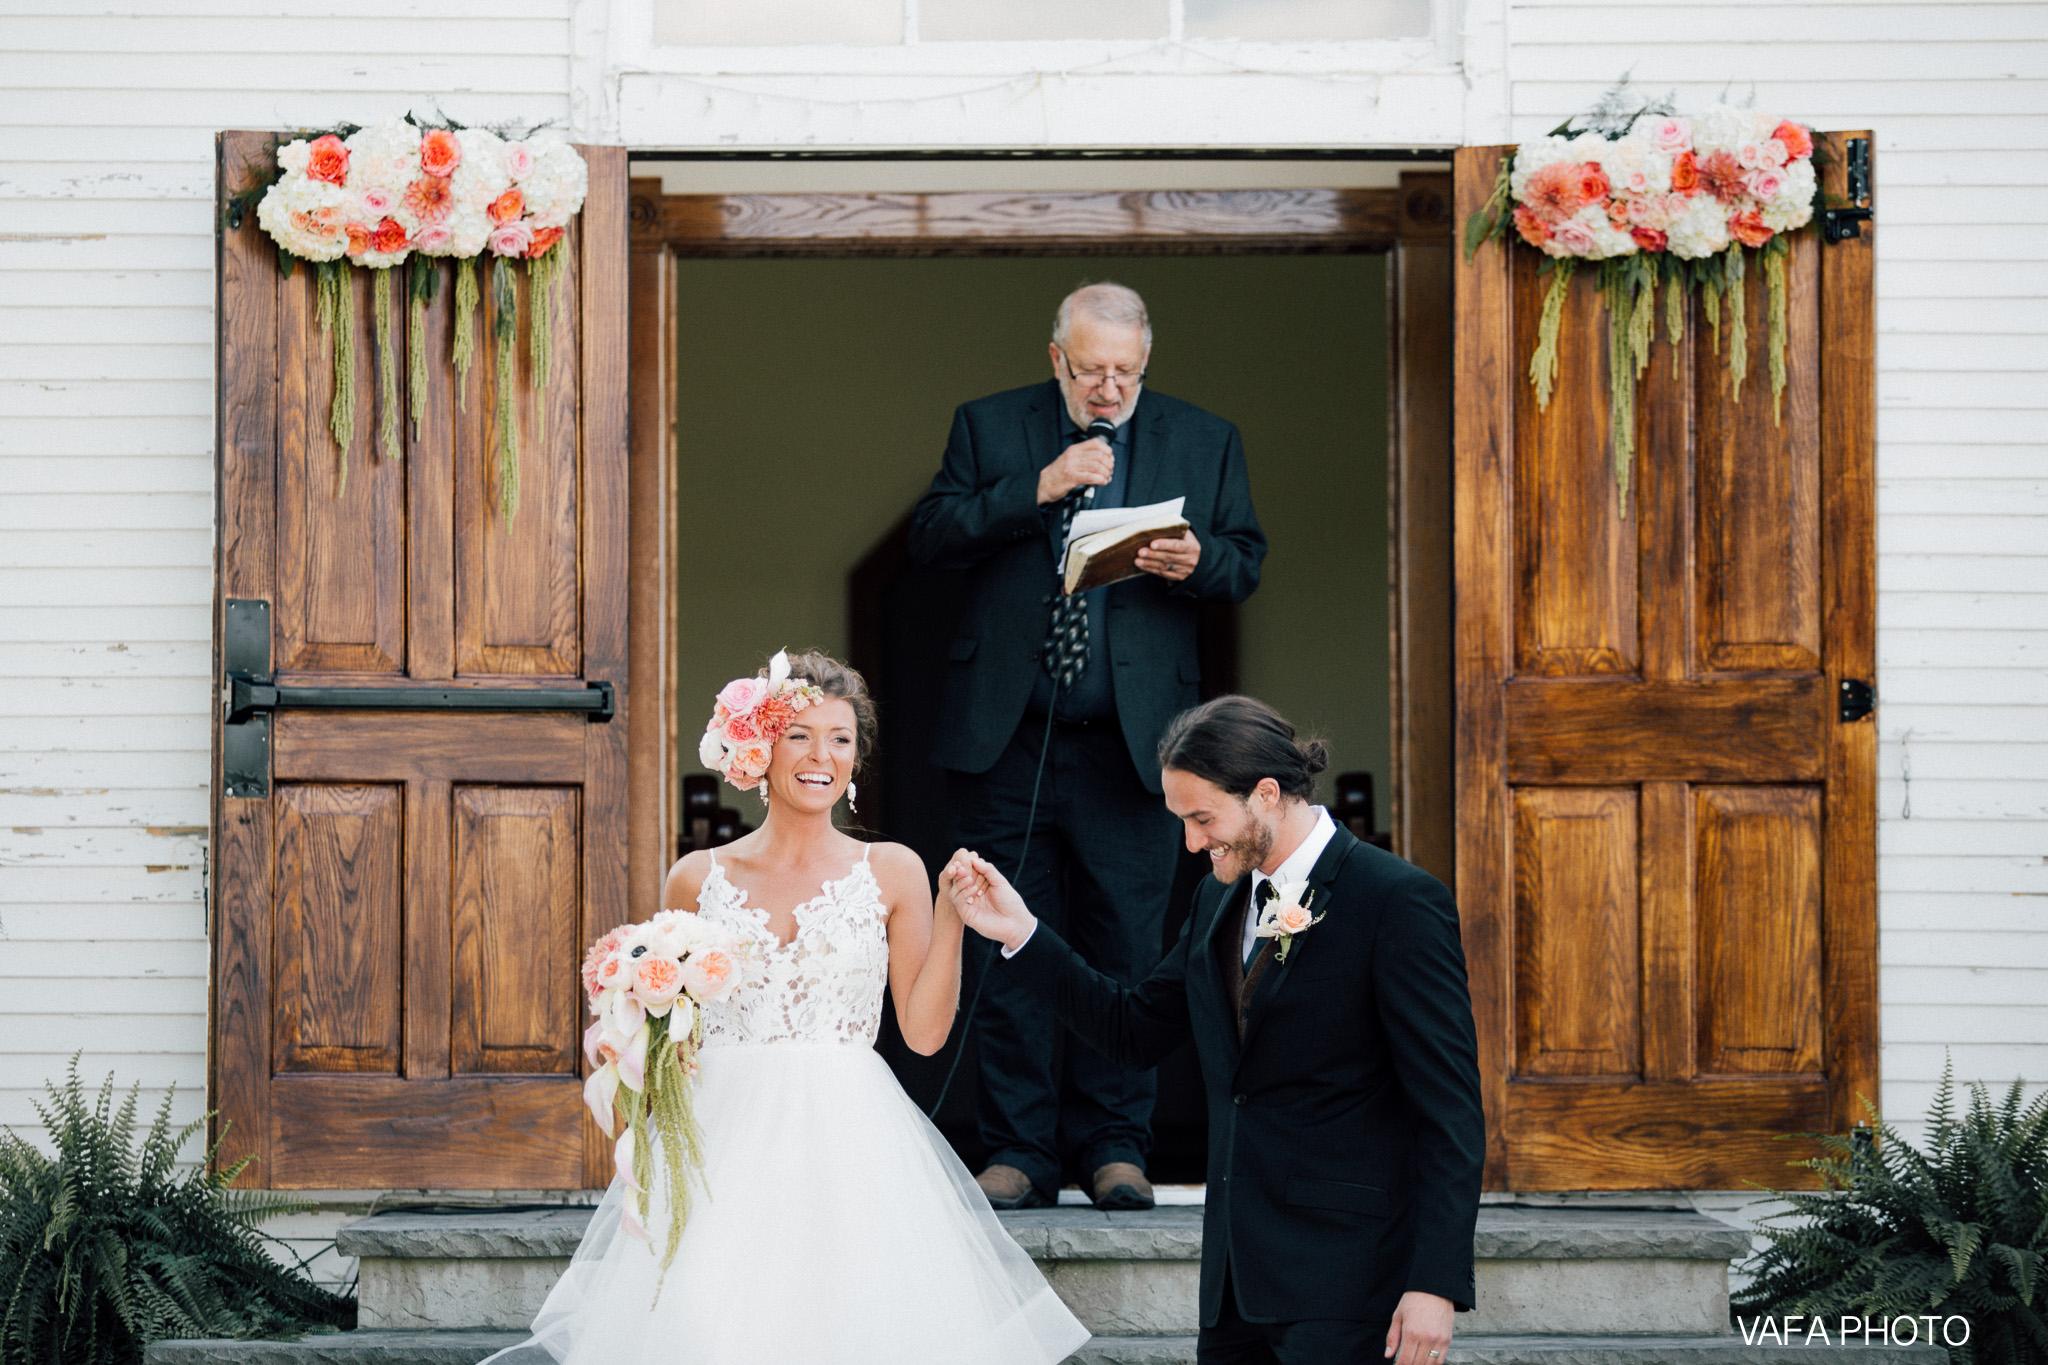 The-Felt-Estate-Wedding-Kailie-David-Vafa-Photo-389.jpg